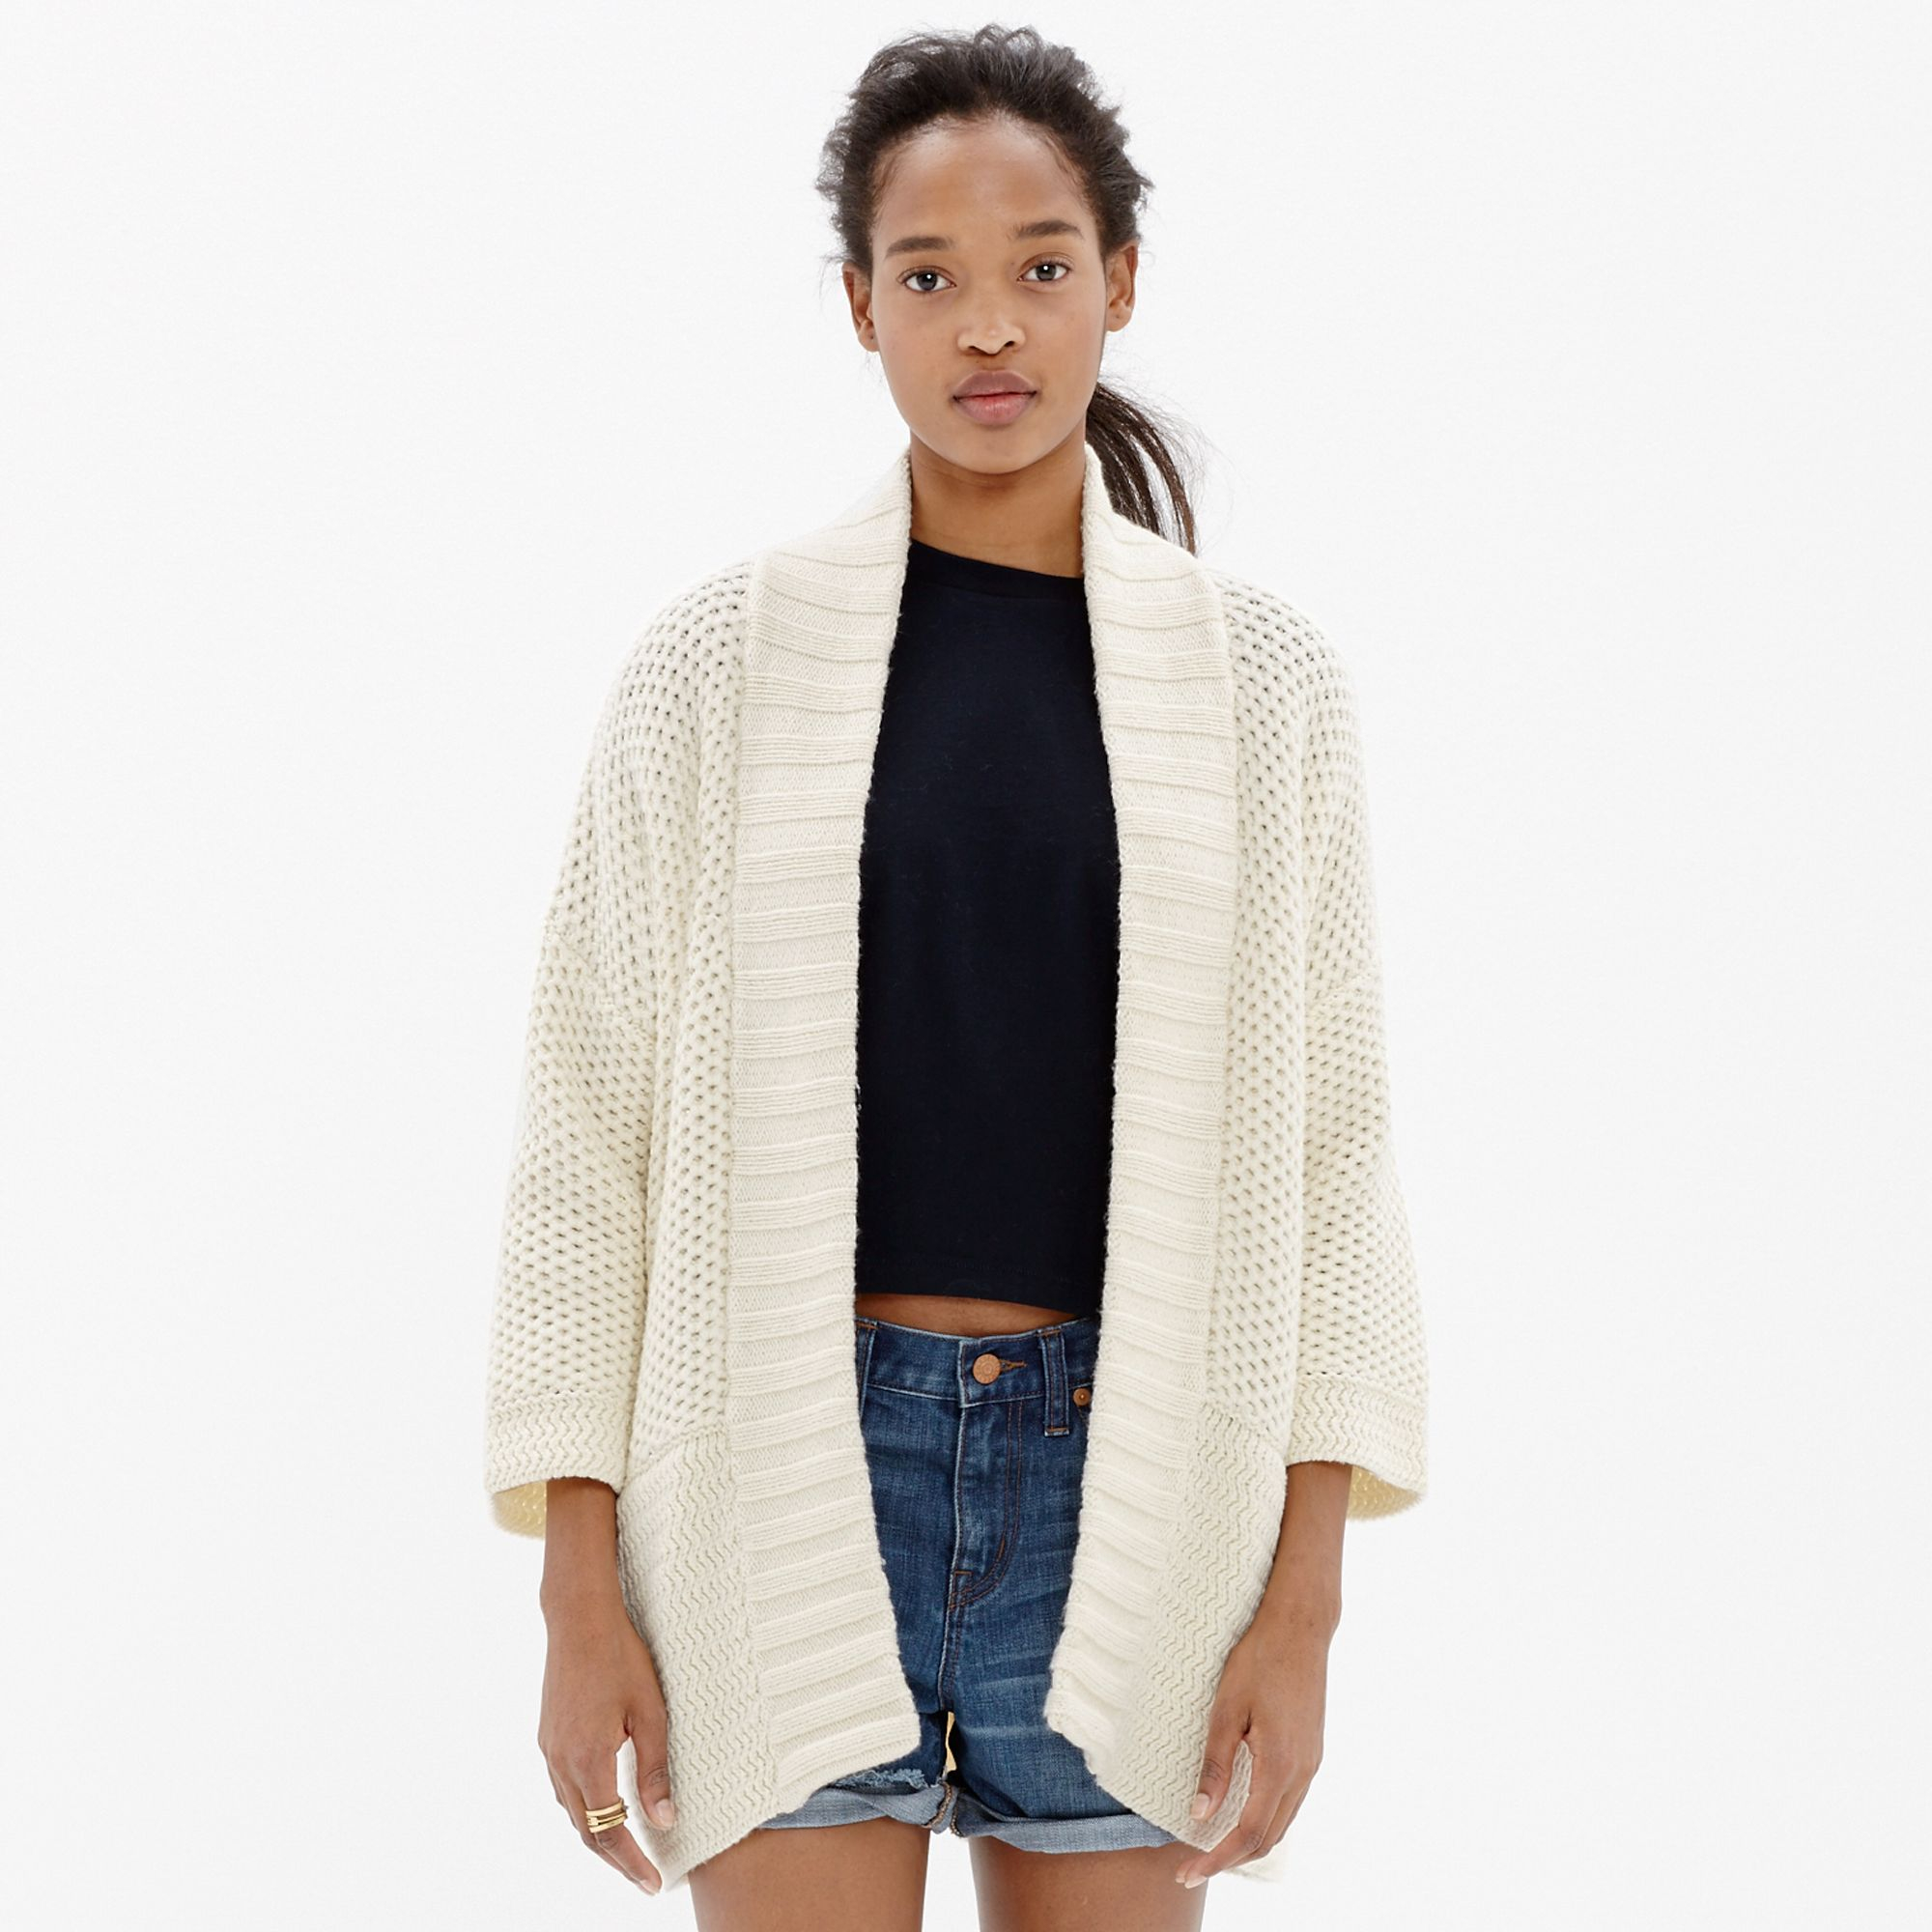 Madewell Kimono Cardigan Sweater in Natural   Lyst